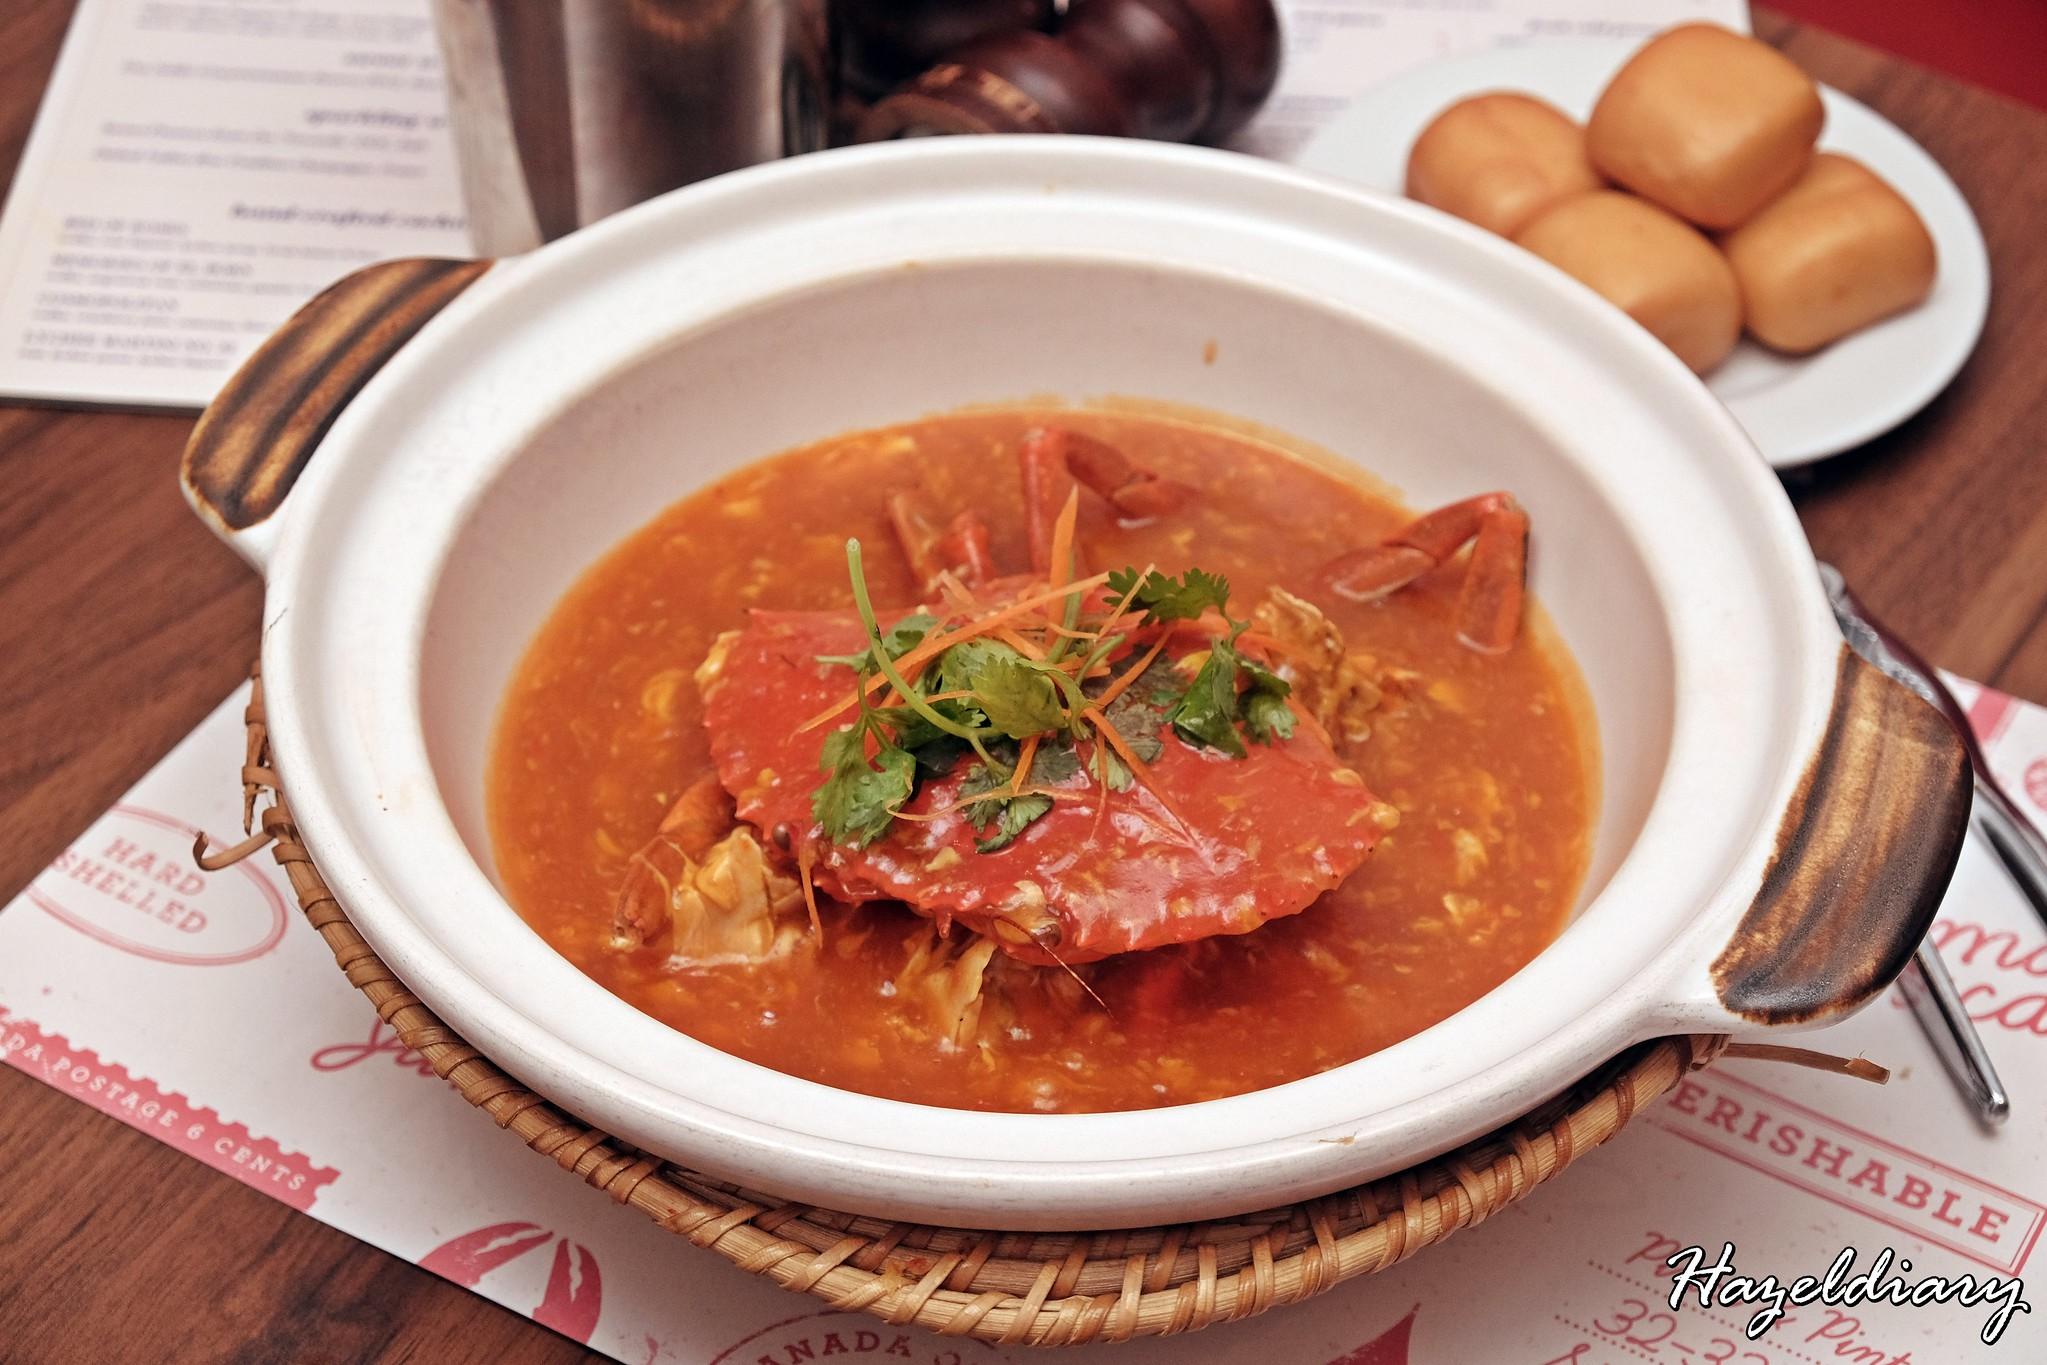 Pince & Pints Duxton Road-Whole Chilli Crab